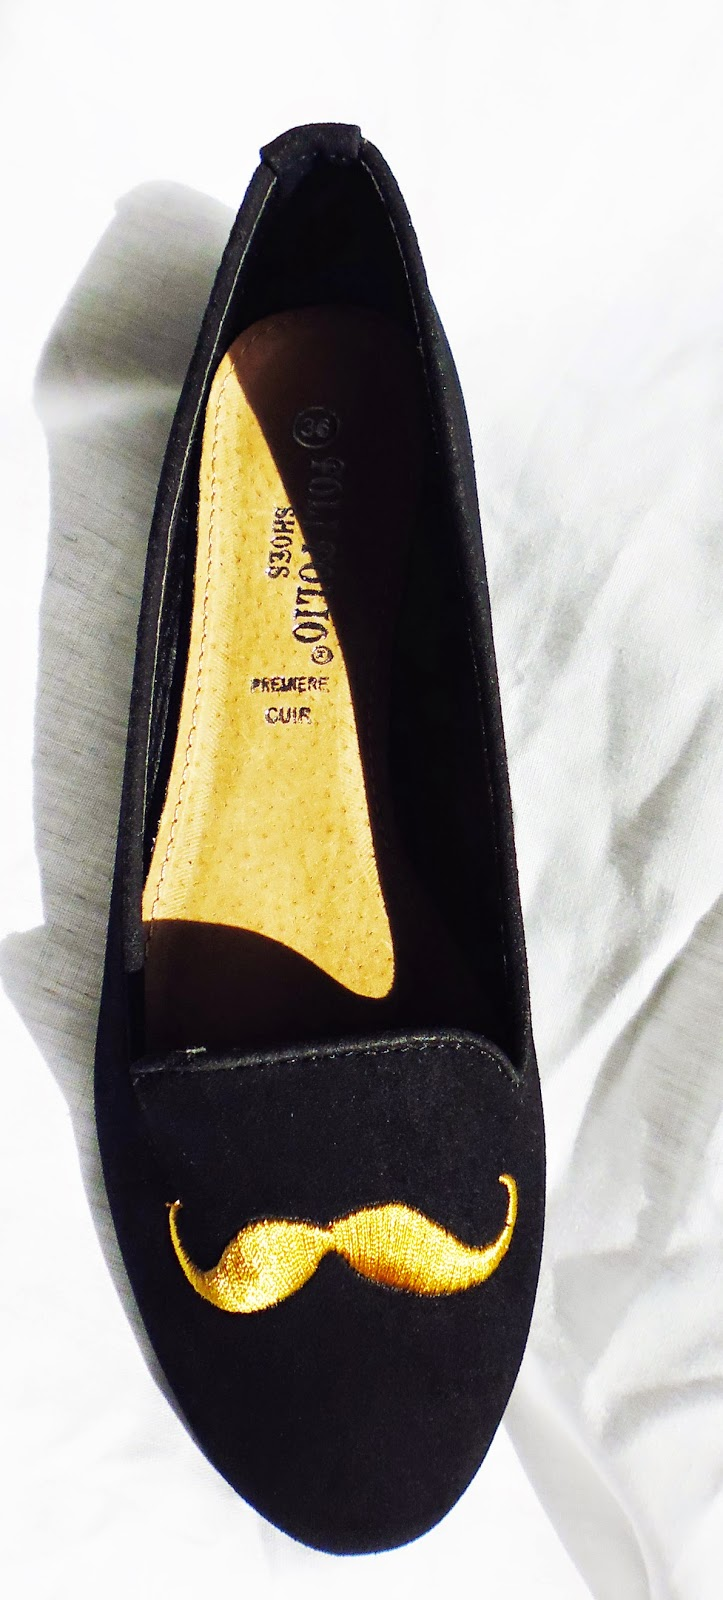 http://www.ebay.fr/itm/ballerines-noires-ballerine-noire-noir-slippers-moustache-doree-petit-prix-WOW-/301087804145?ssPageName=STRK:MESE:IT